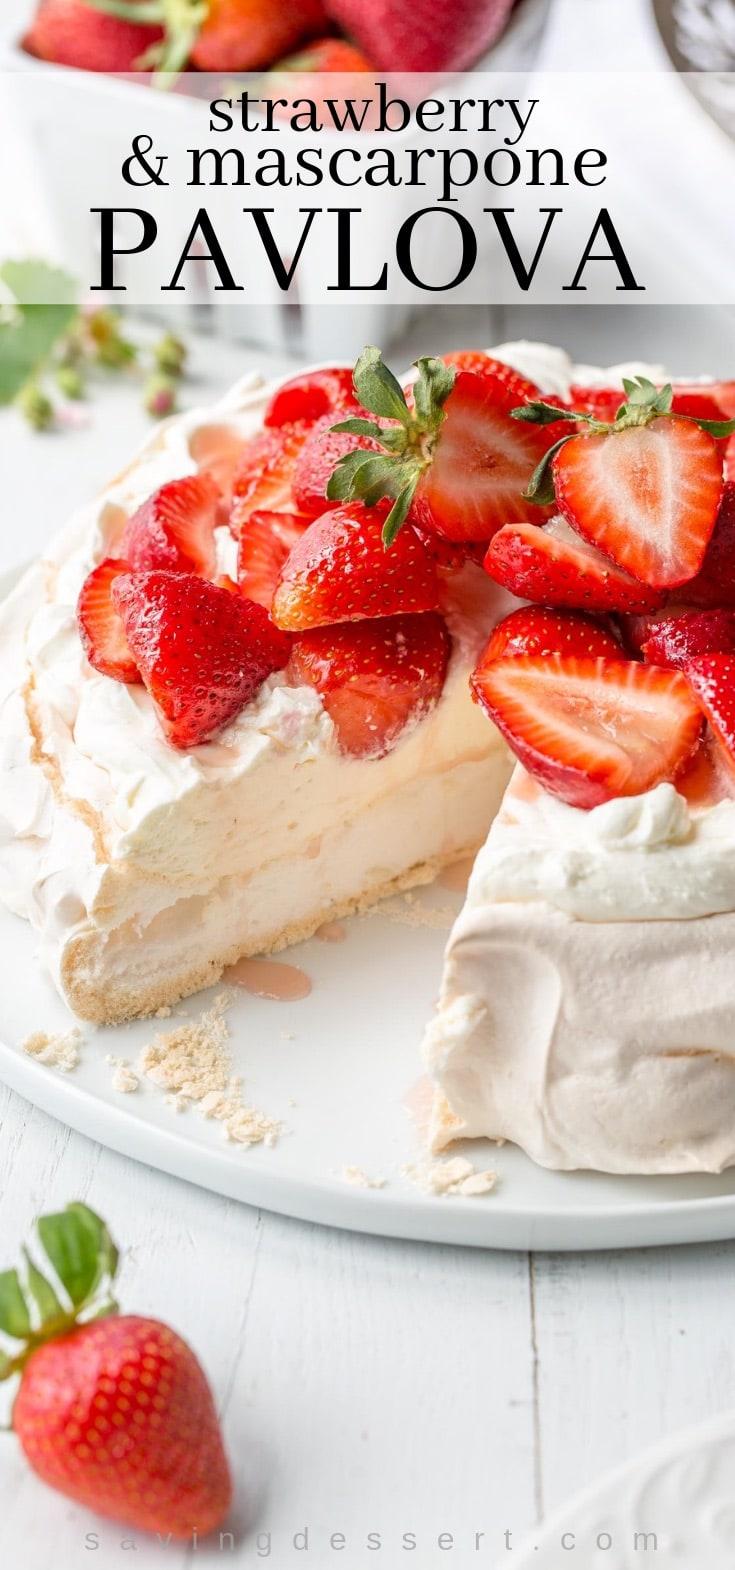 A strawberry pavlova topped with mascarpone cream